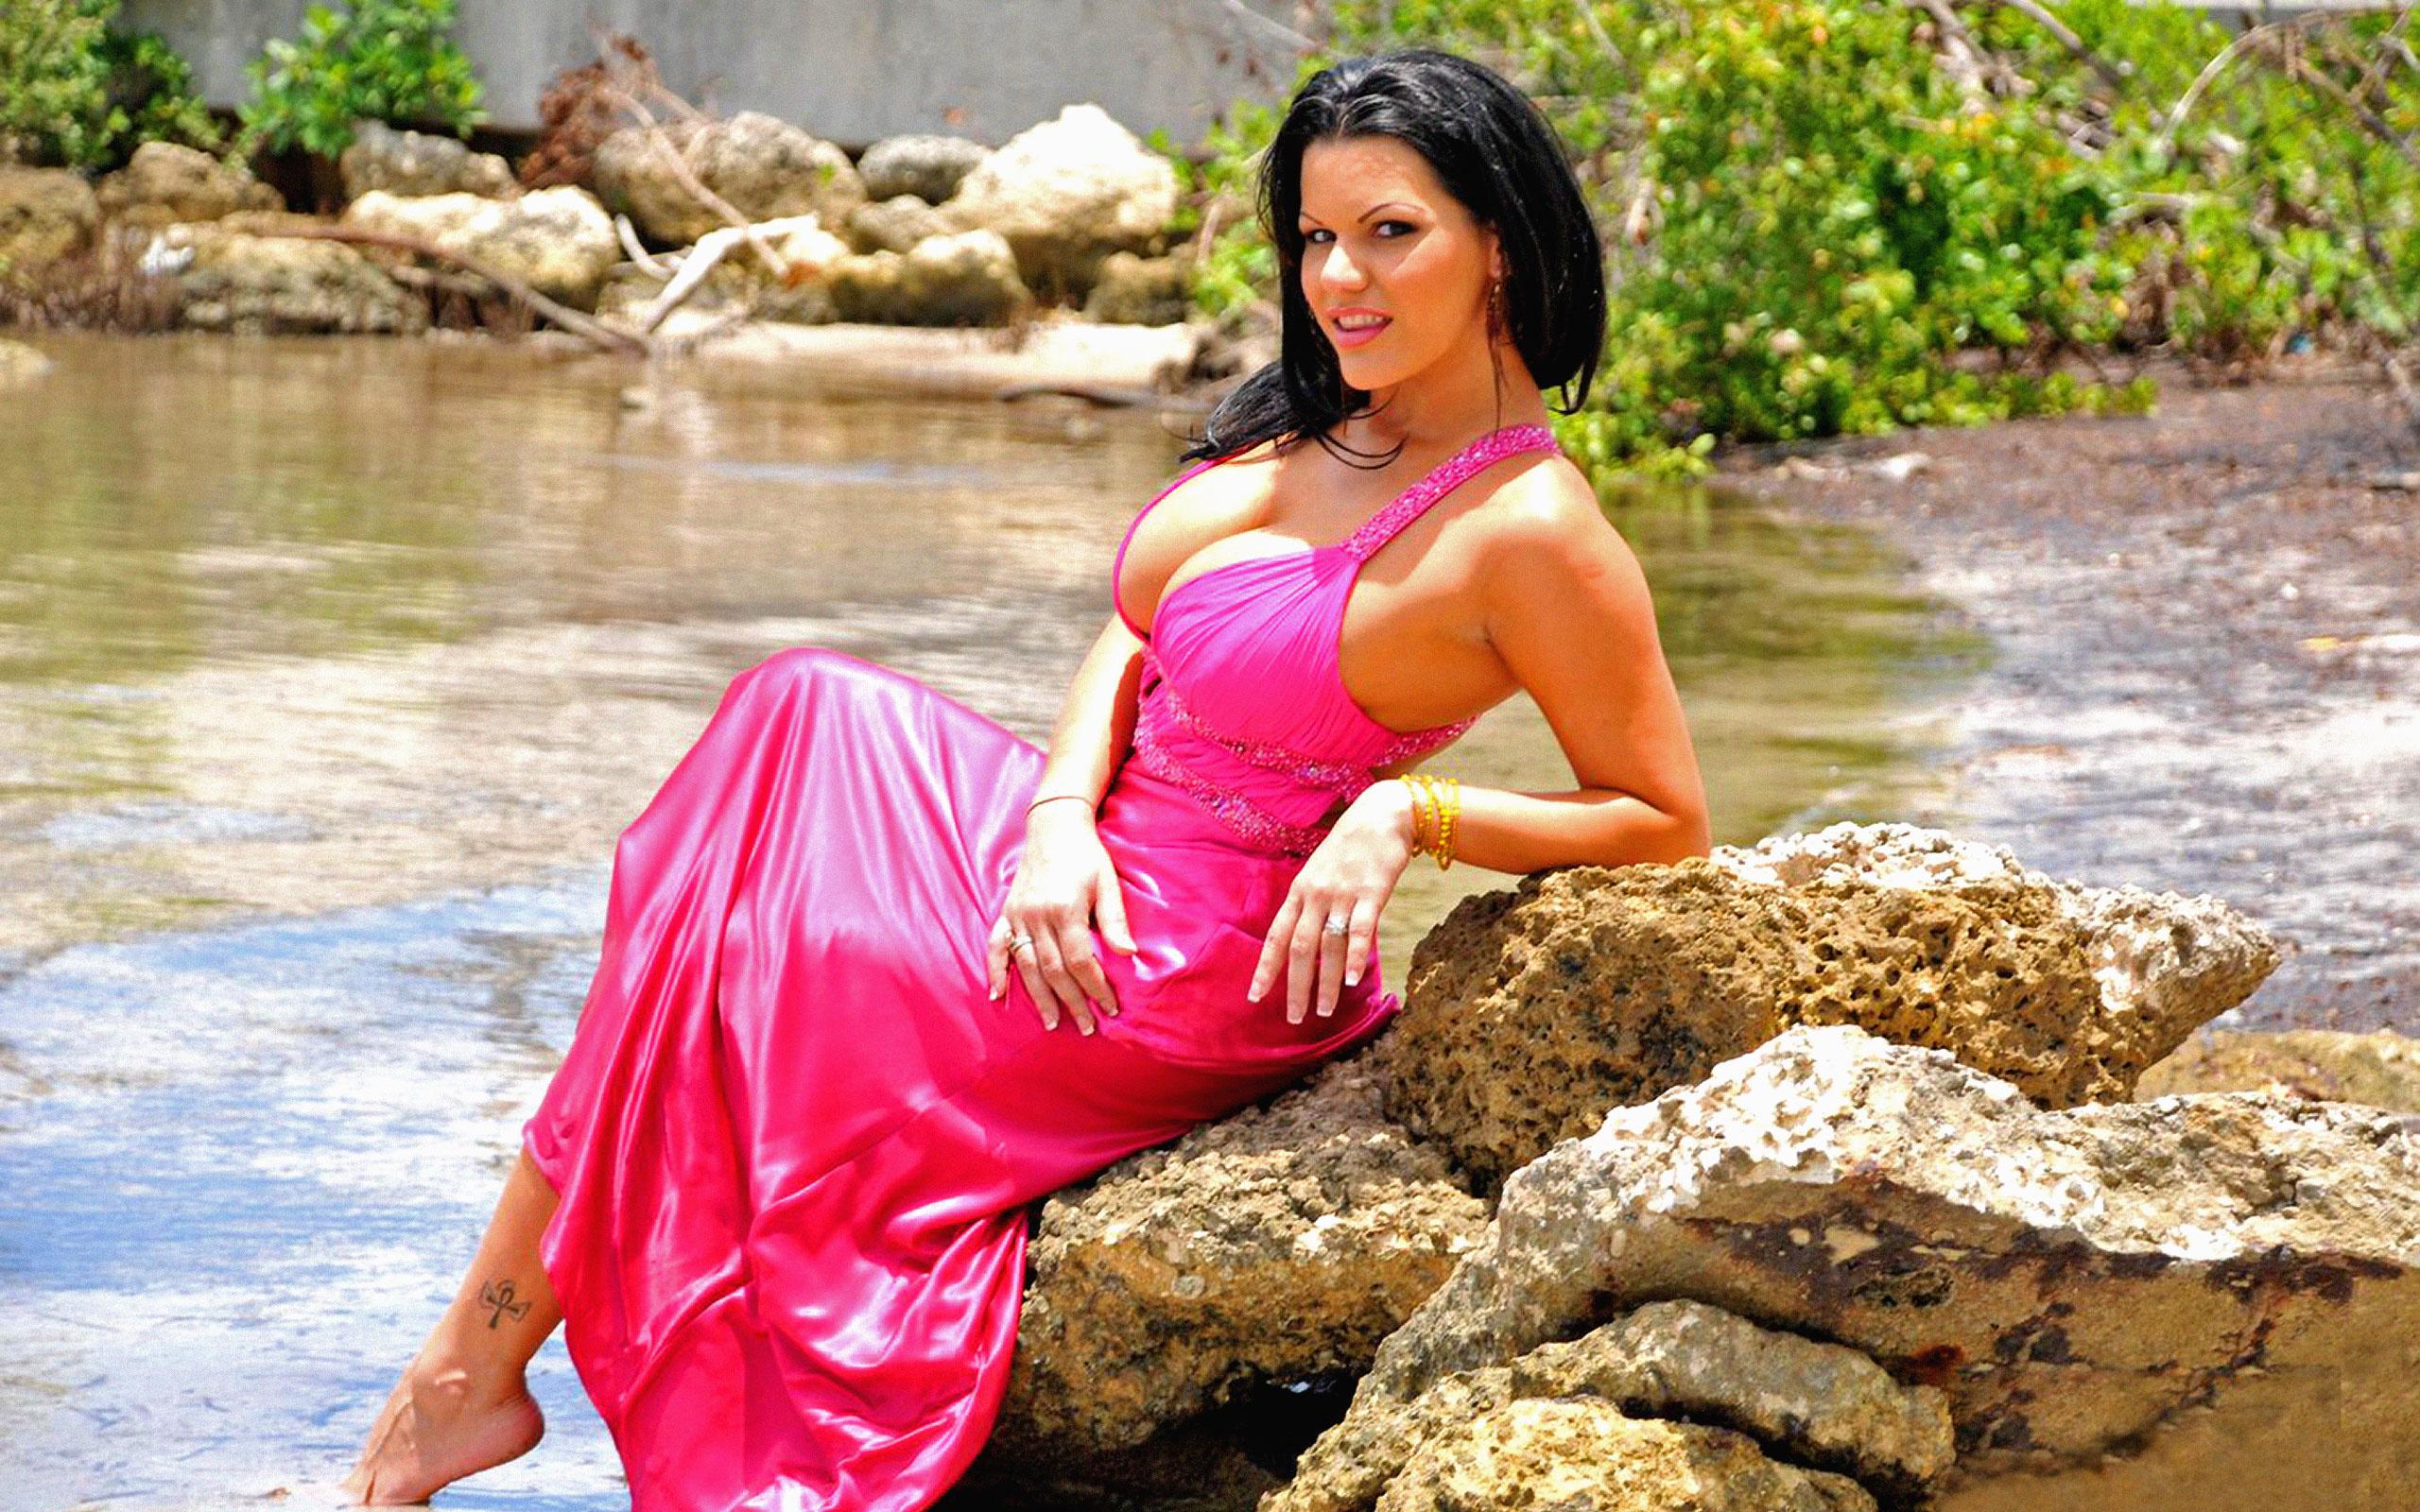 Milf outdoor posing of luxurious babe Lexxxi Lockhart will turn you on № 906369 без смс